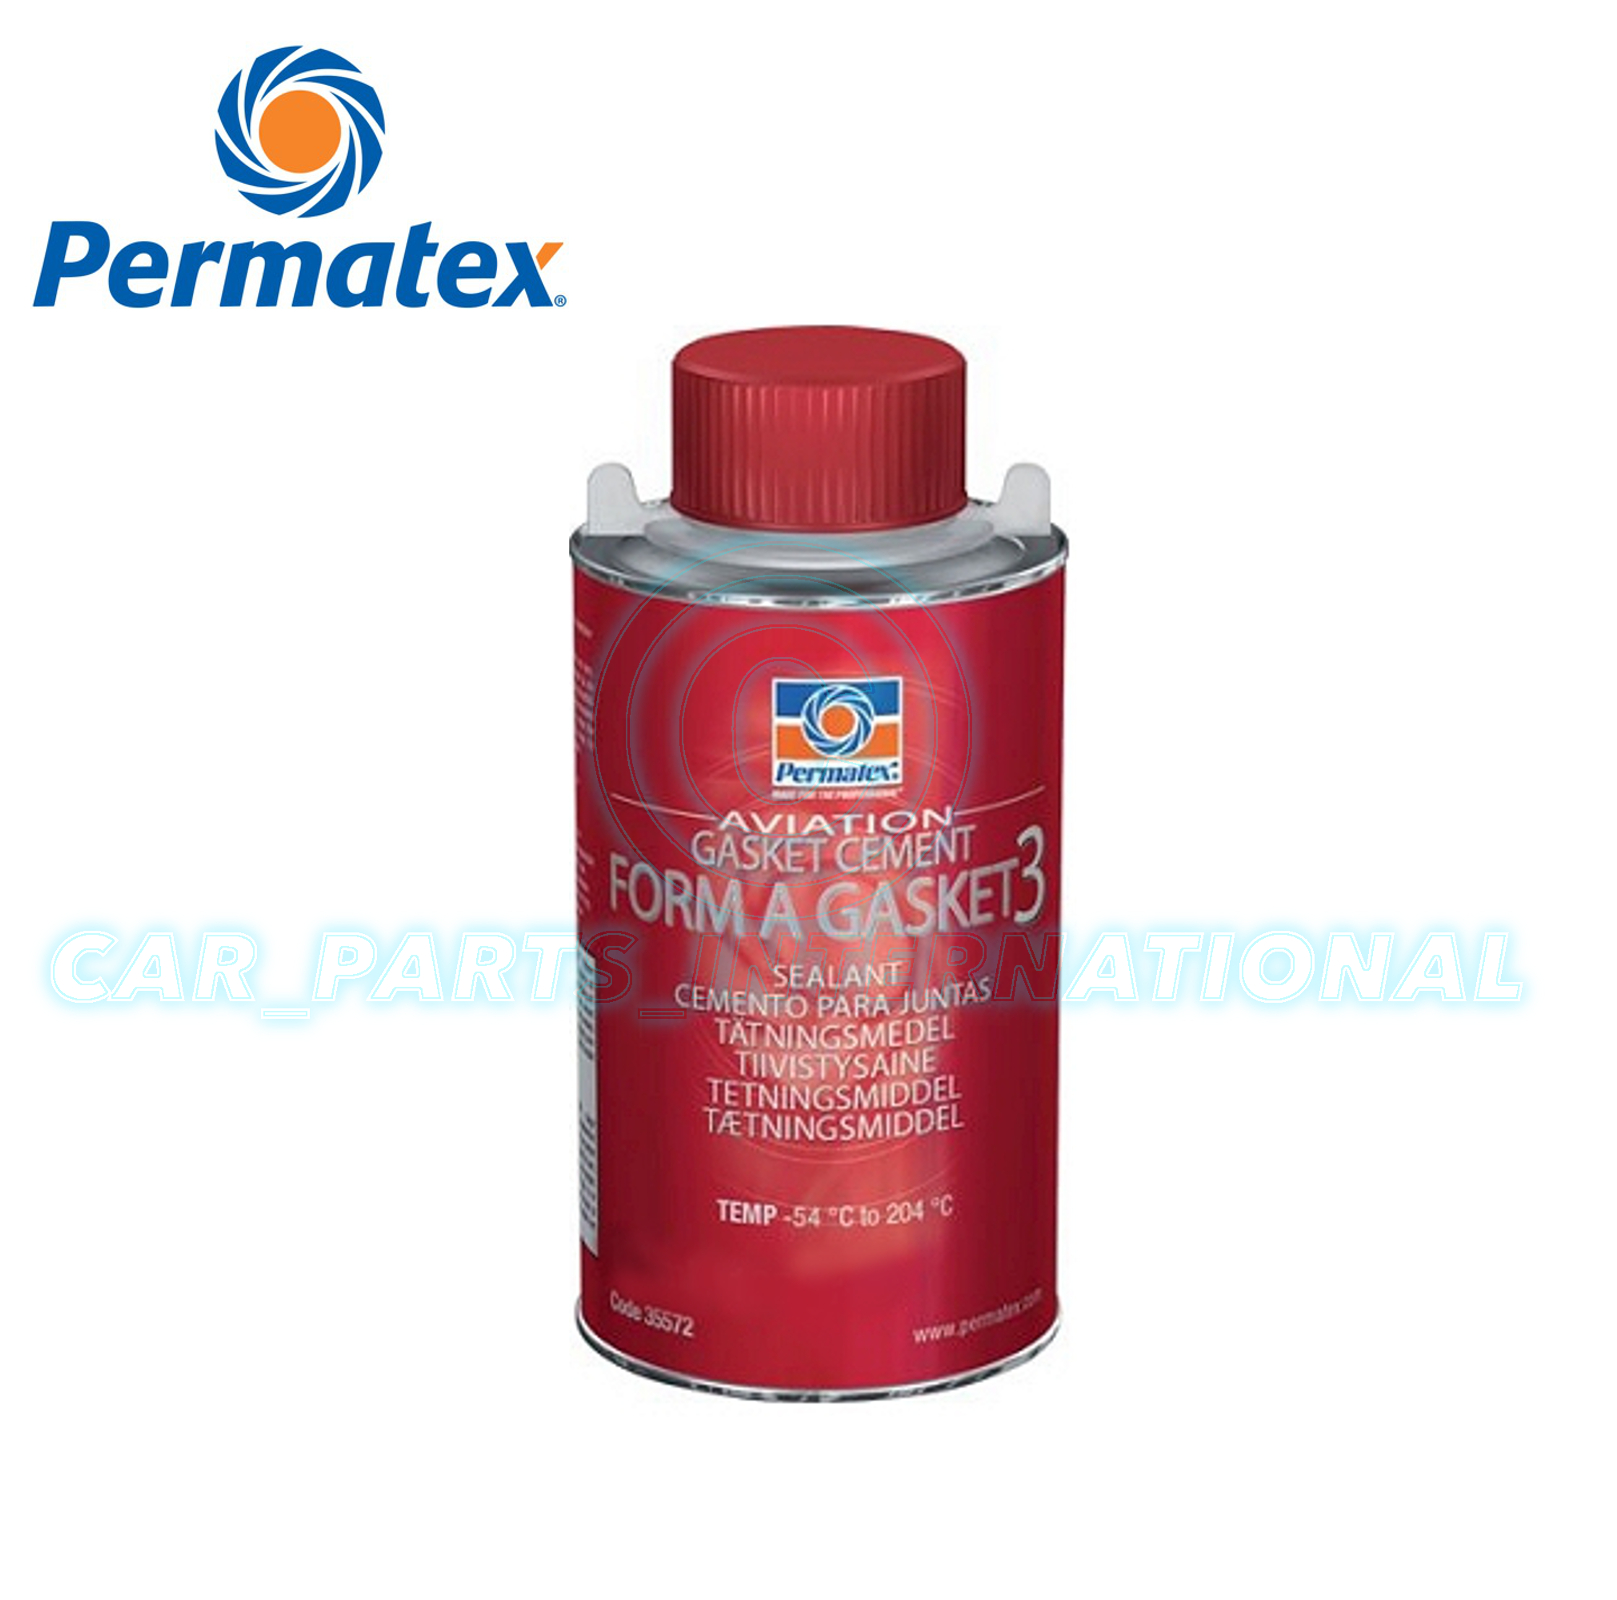 Permatex Aviation Form-A-Gasket No.3 Sealant Liquid - 115ml ...